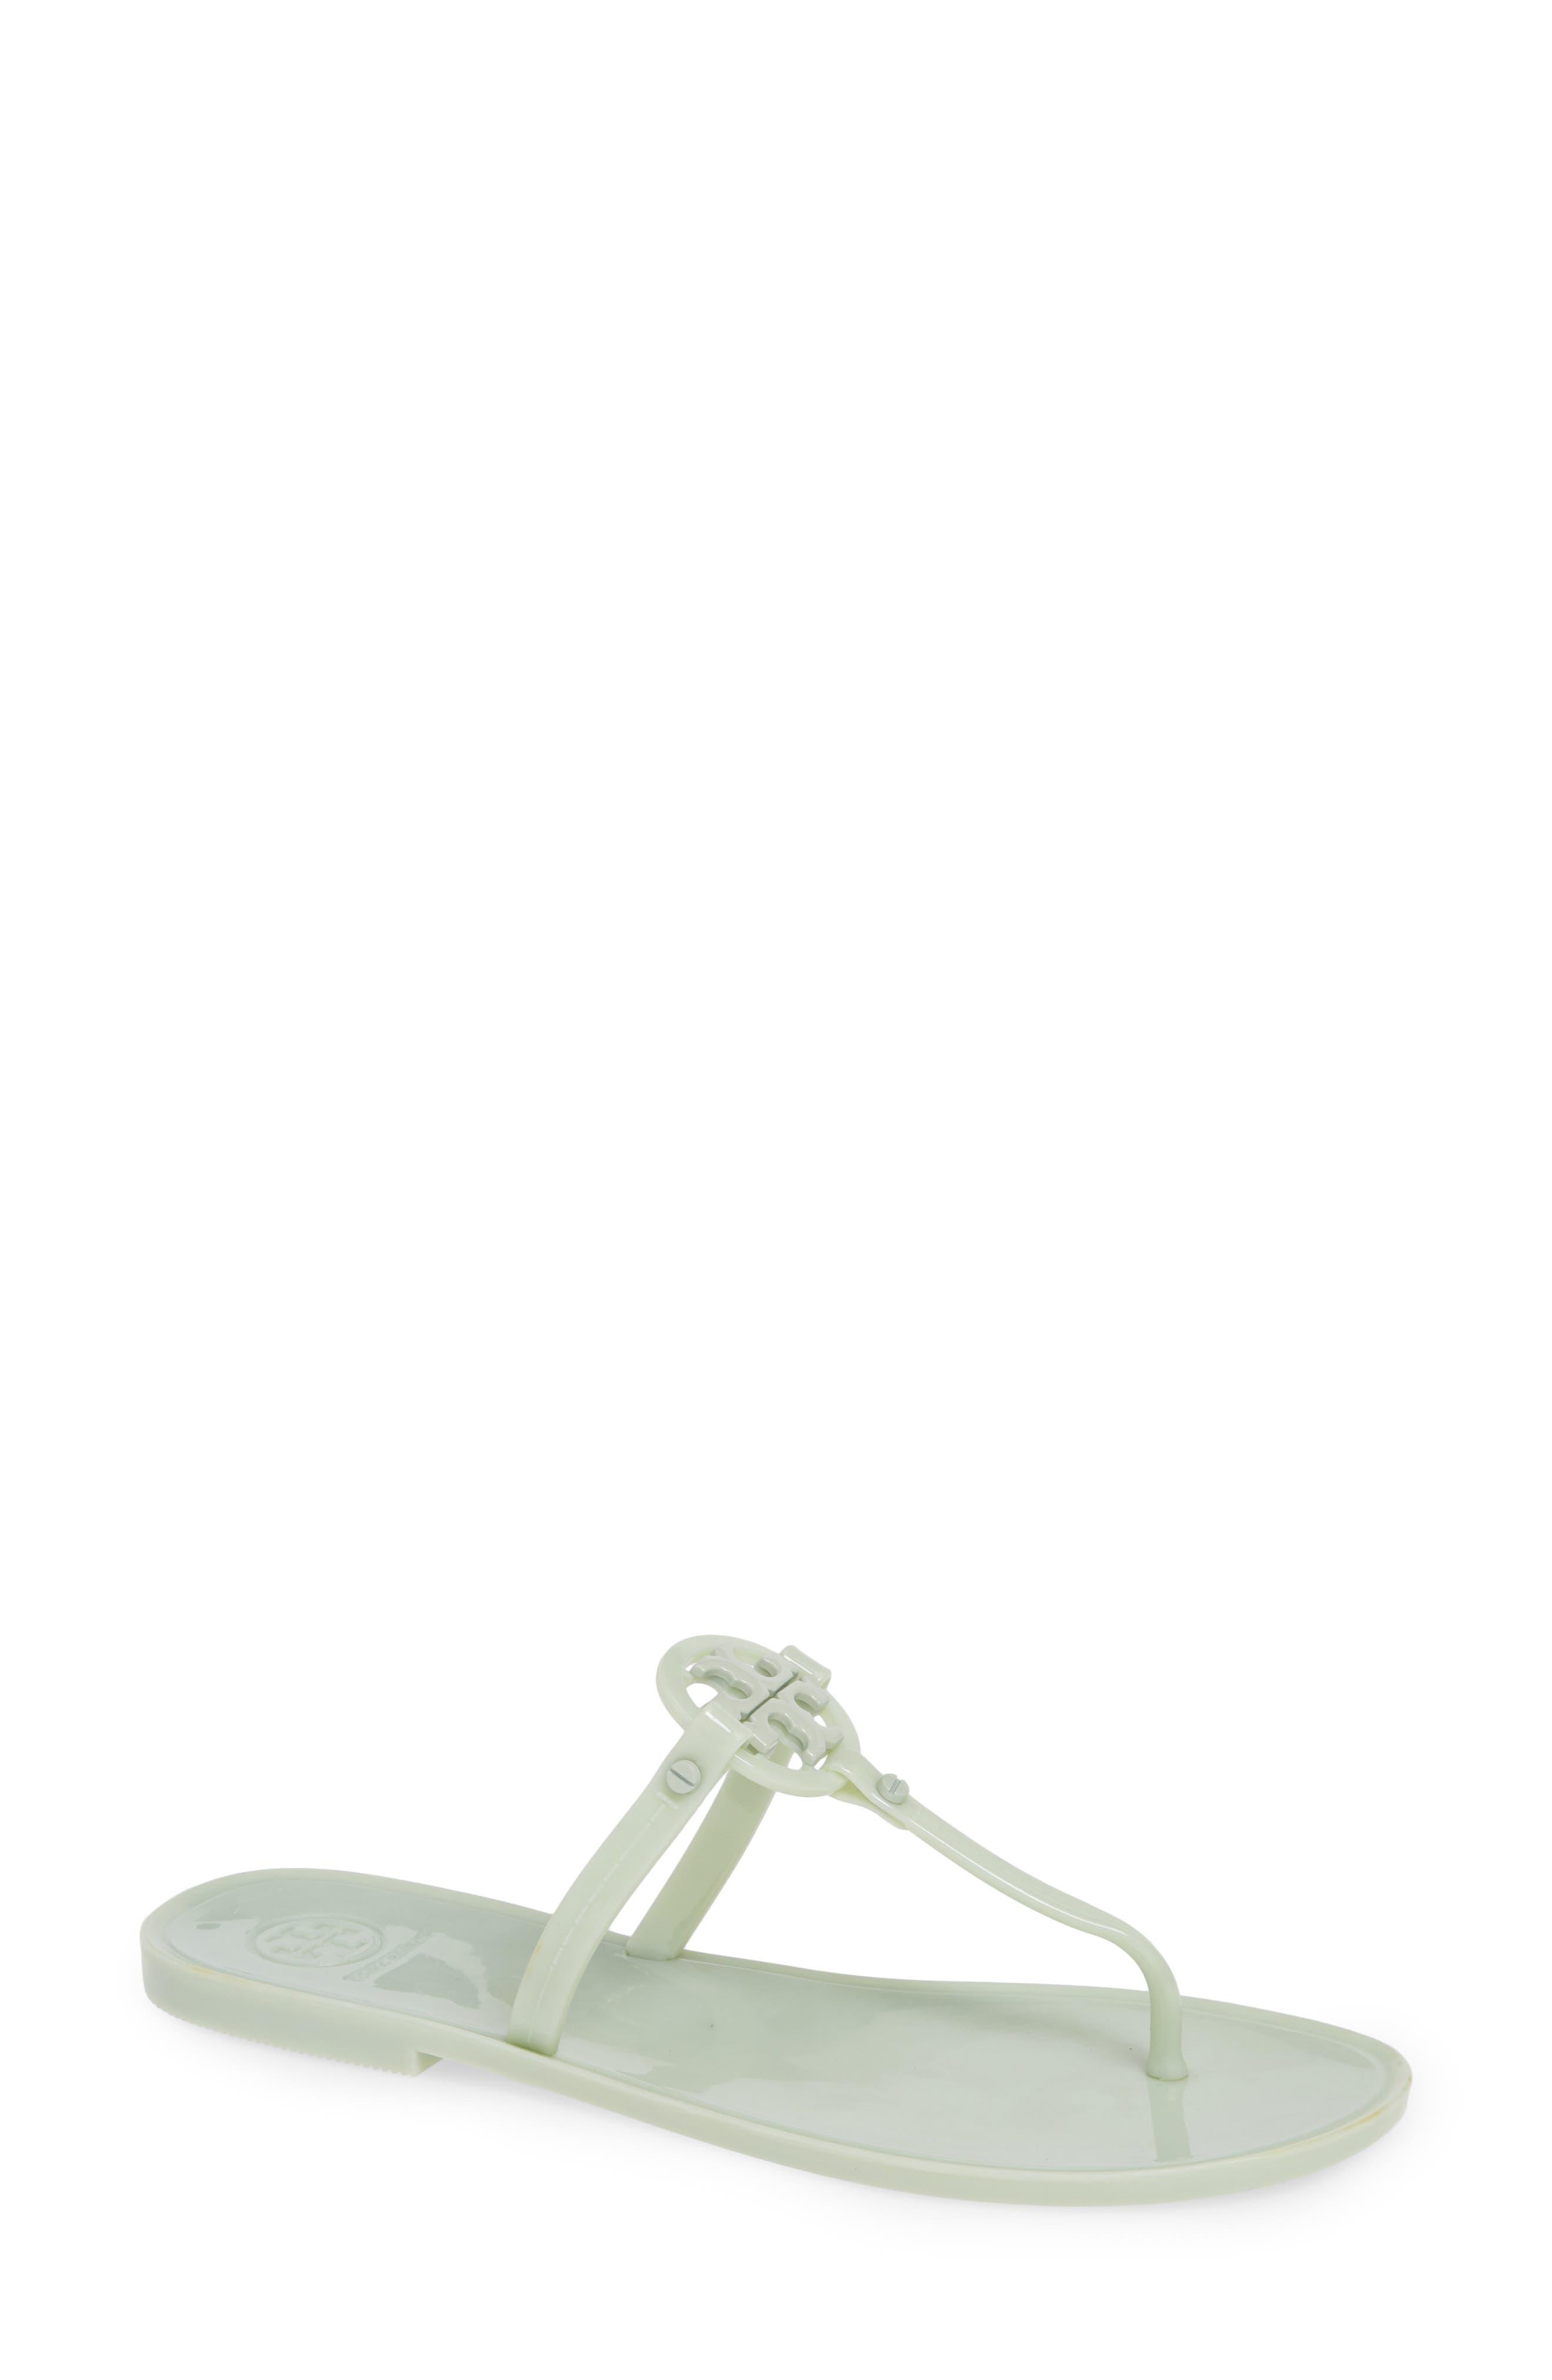 1e1110cb0fa Tory Burch  Mini Miller  Flat Sandal